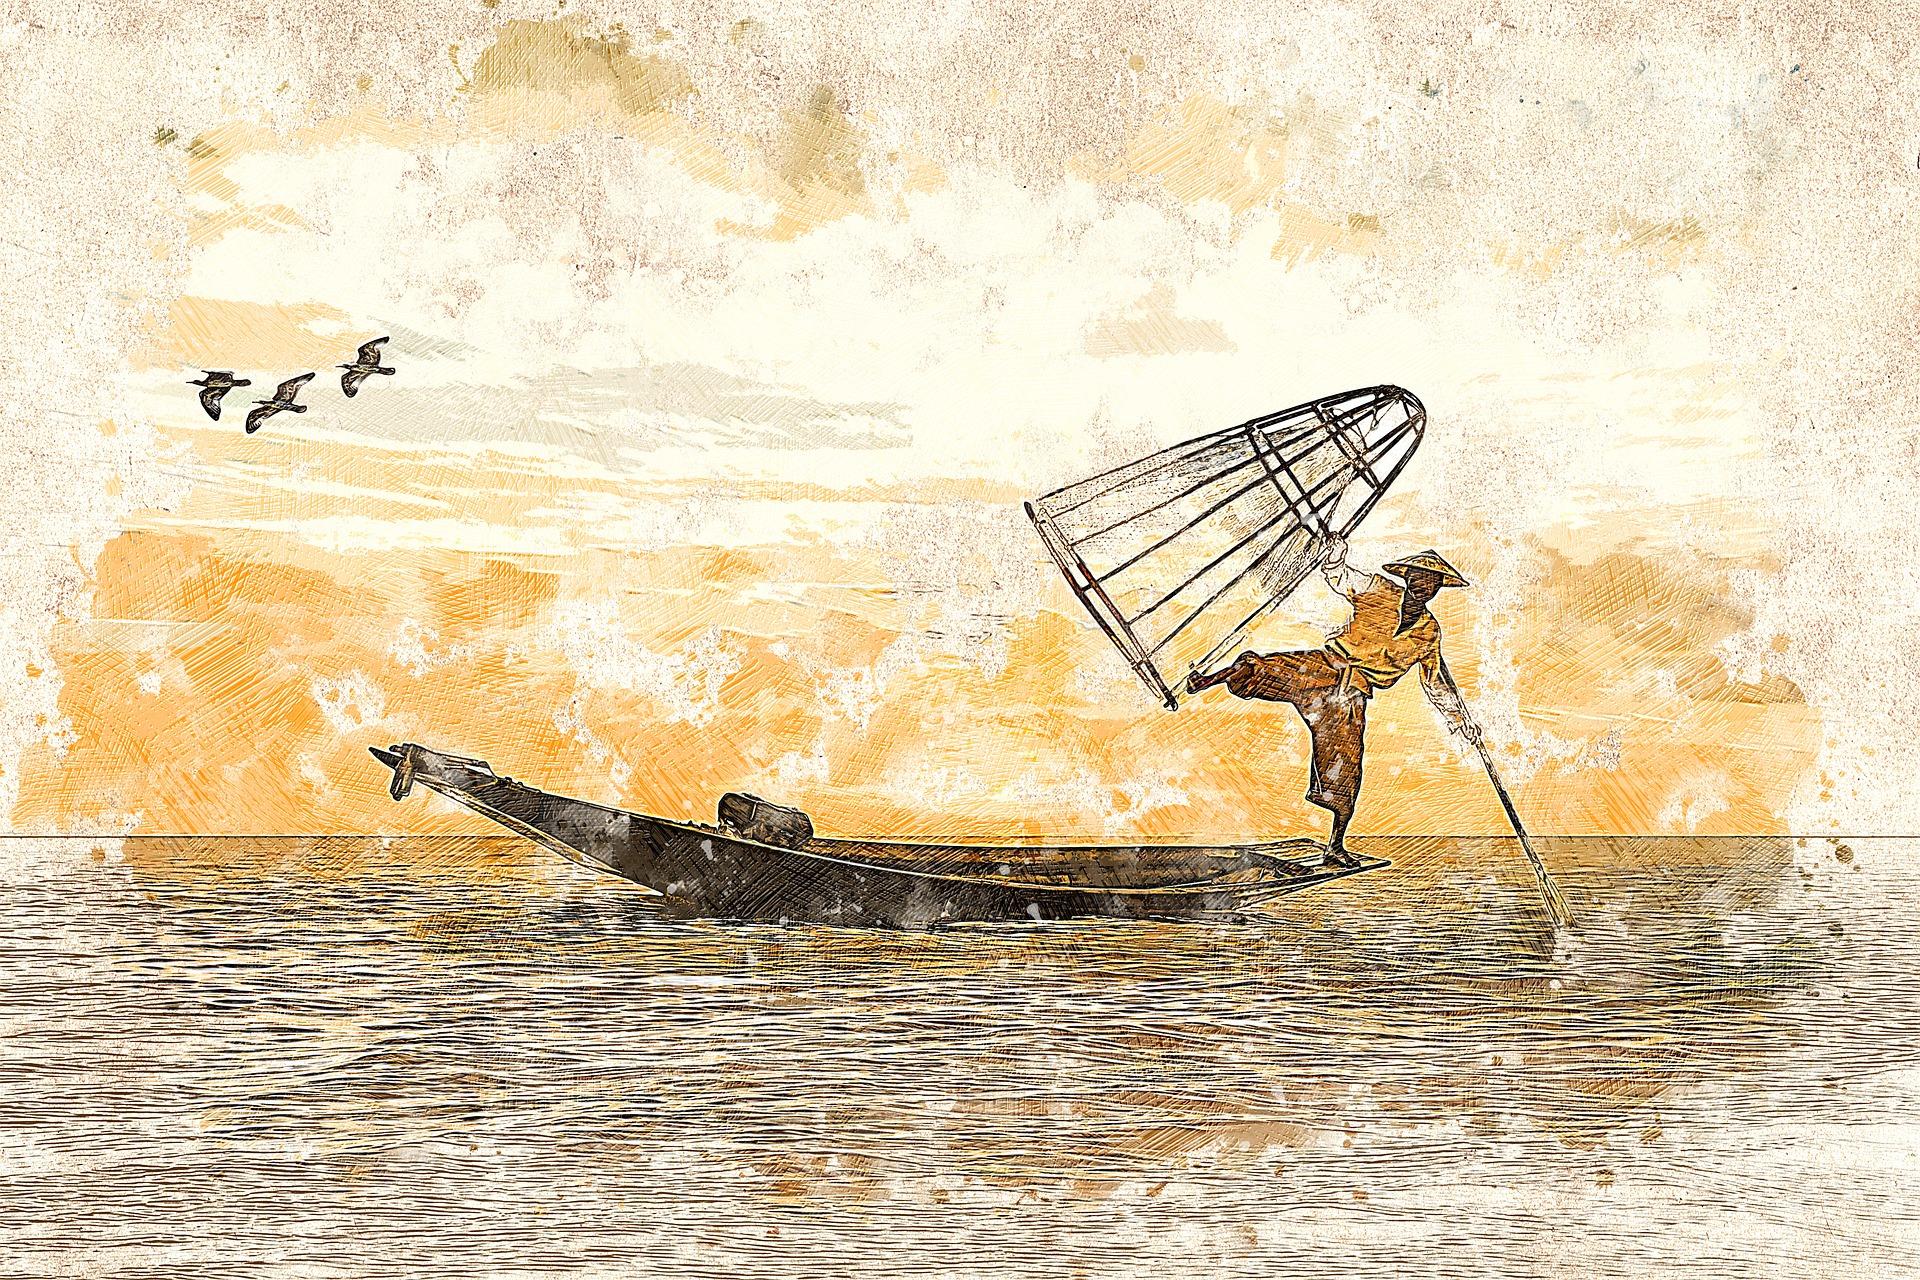 Coromandel Fishers Poem Summary By Sarojini Naidu Beaming Notes